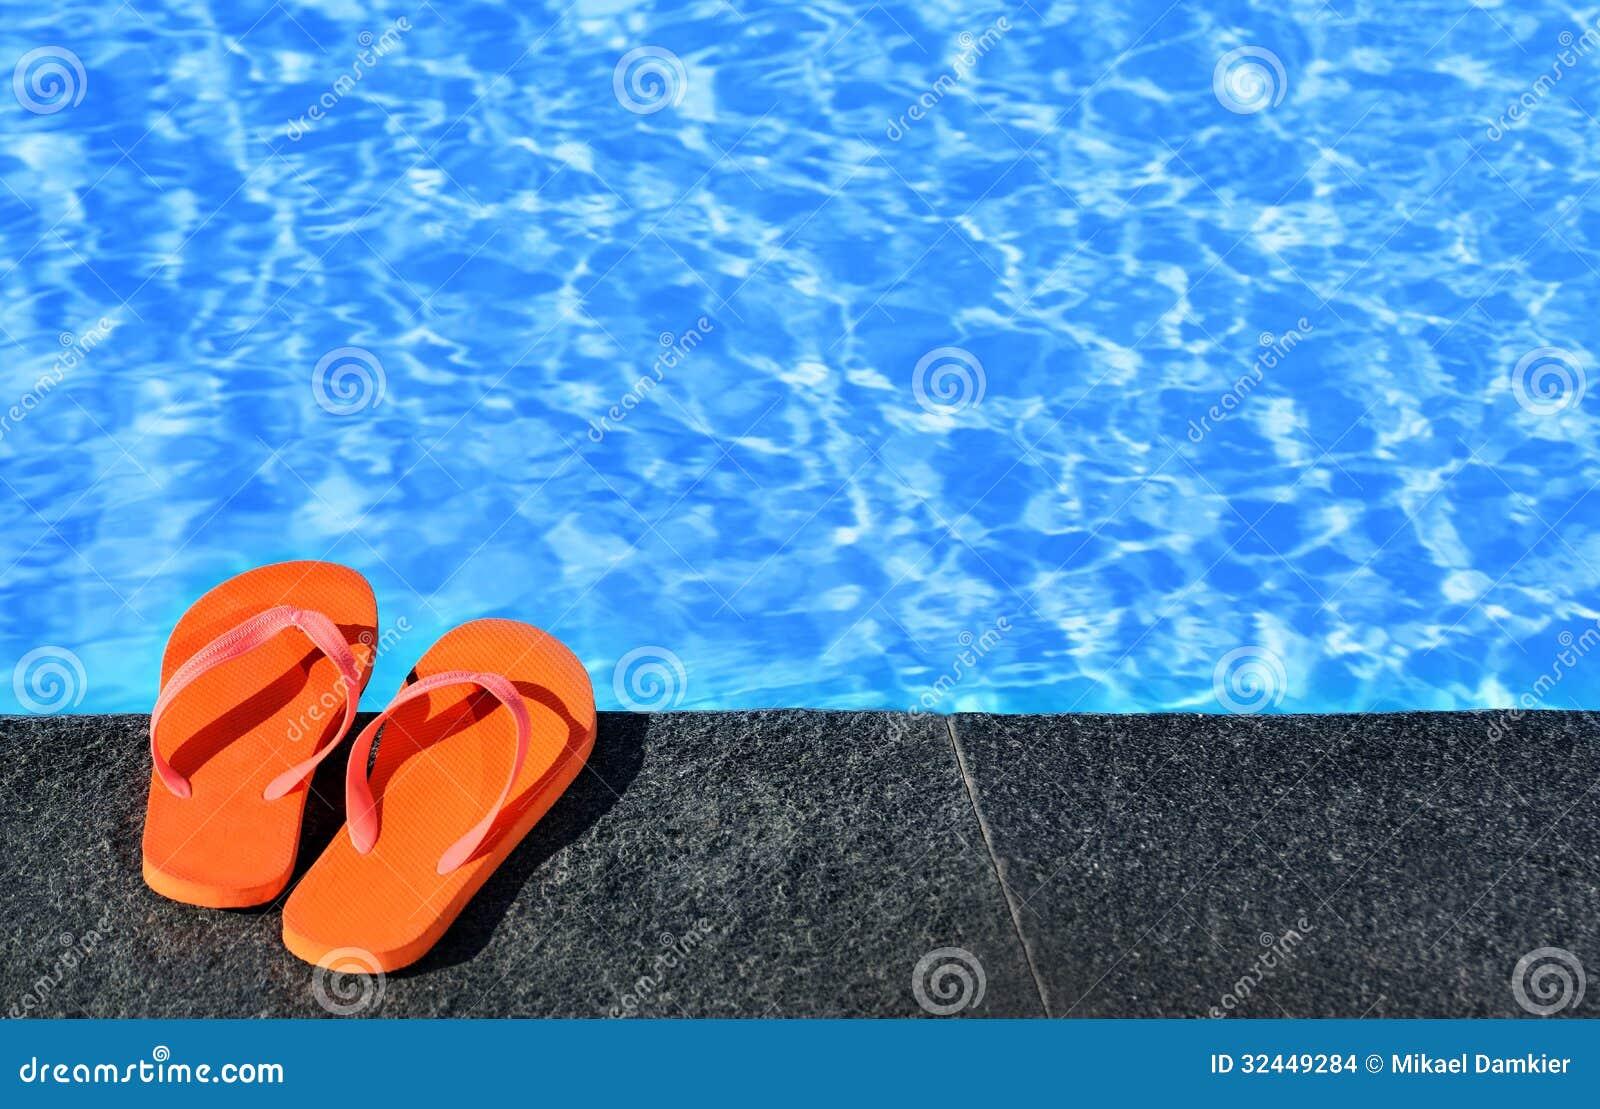 Sandalias por una piscina